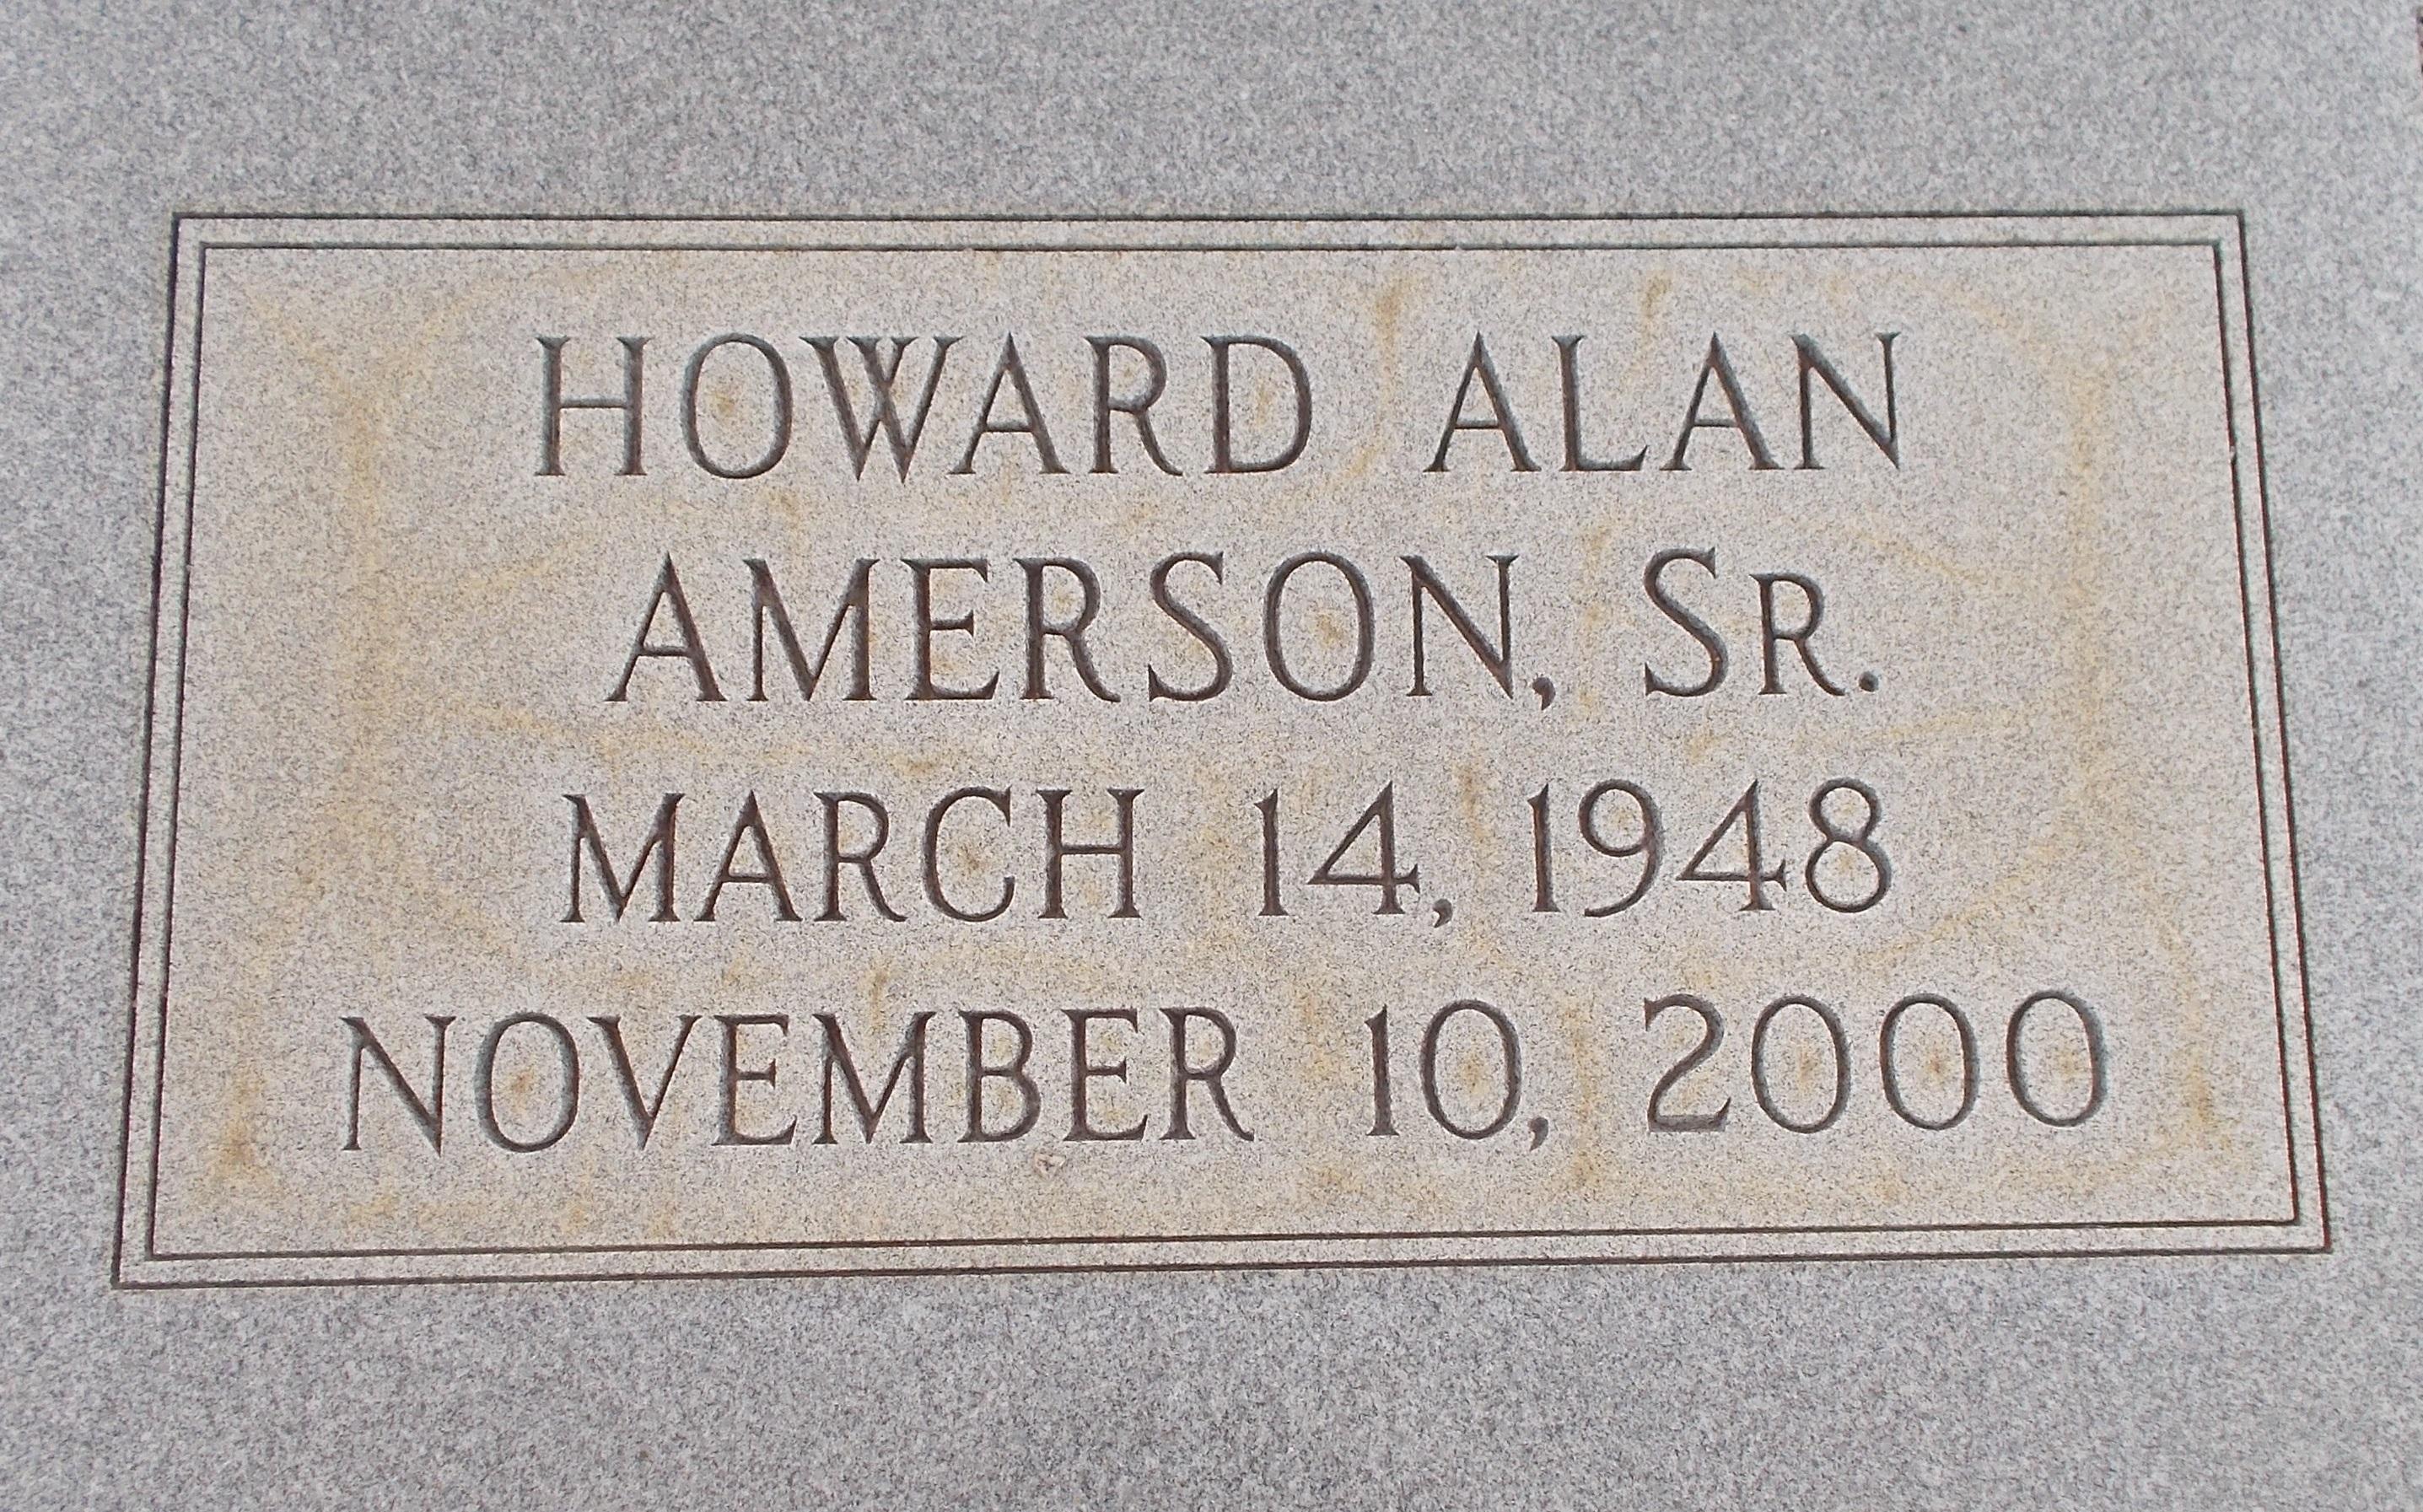 Howard Alan Amerson, Sr